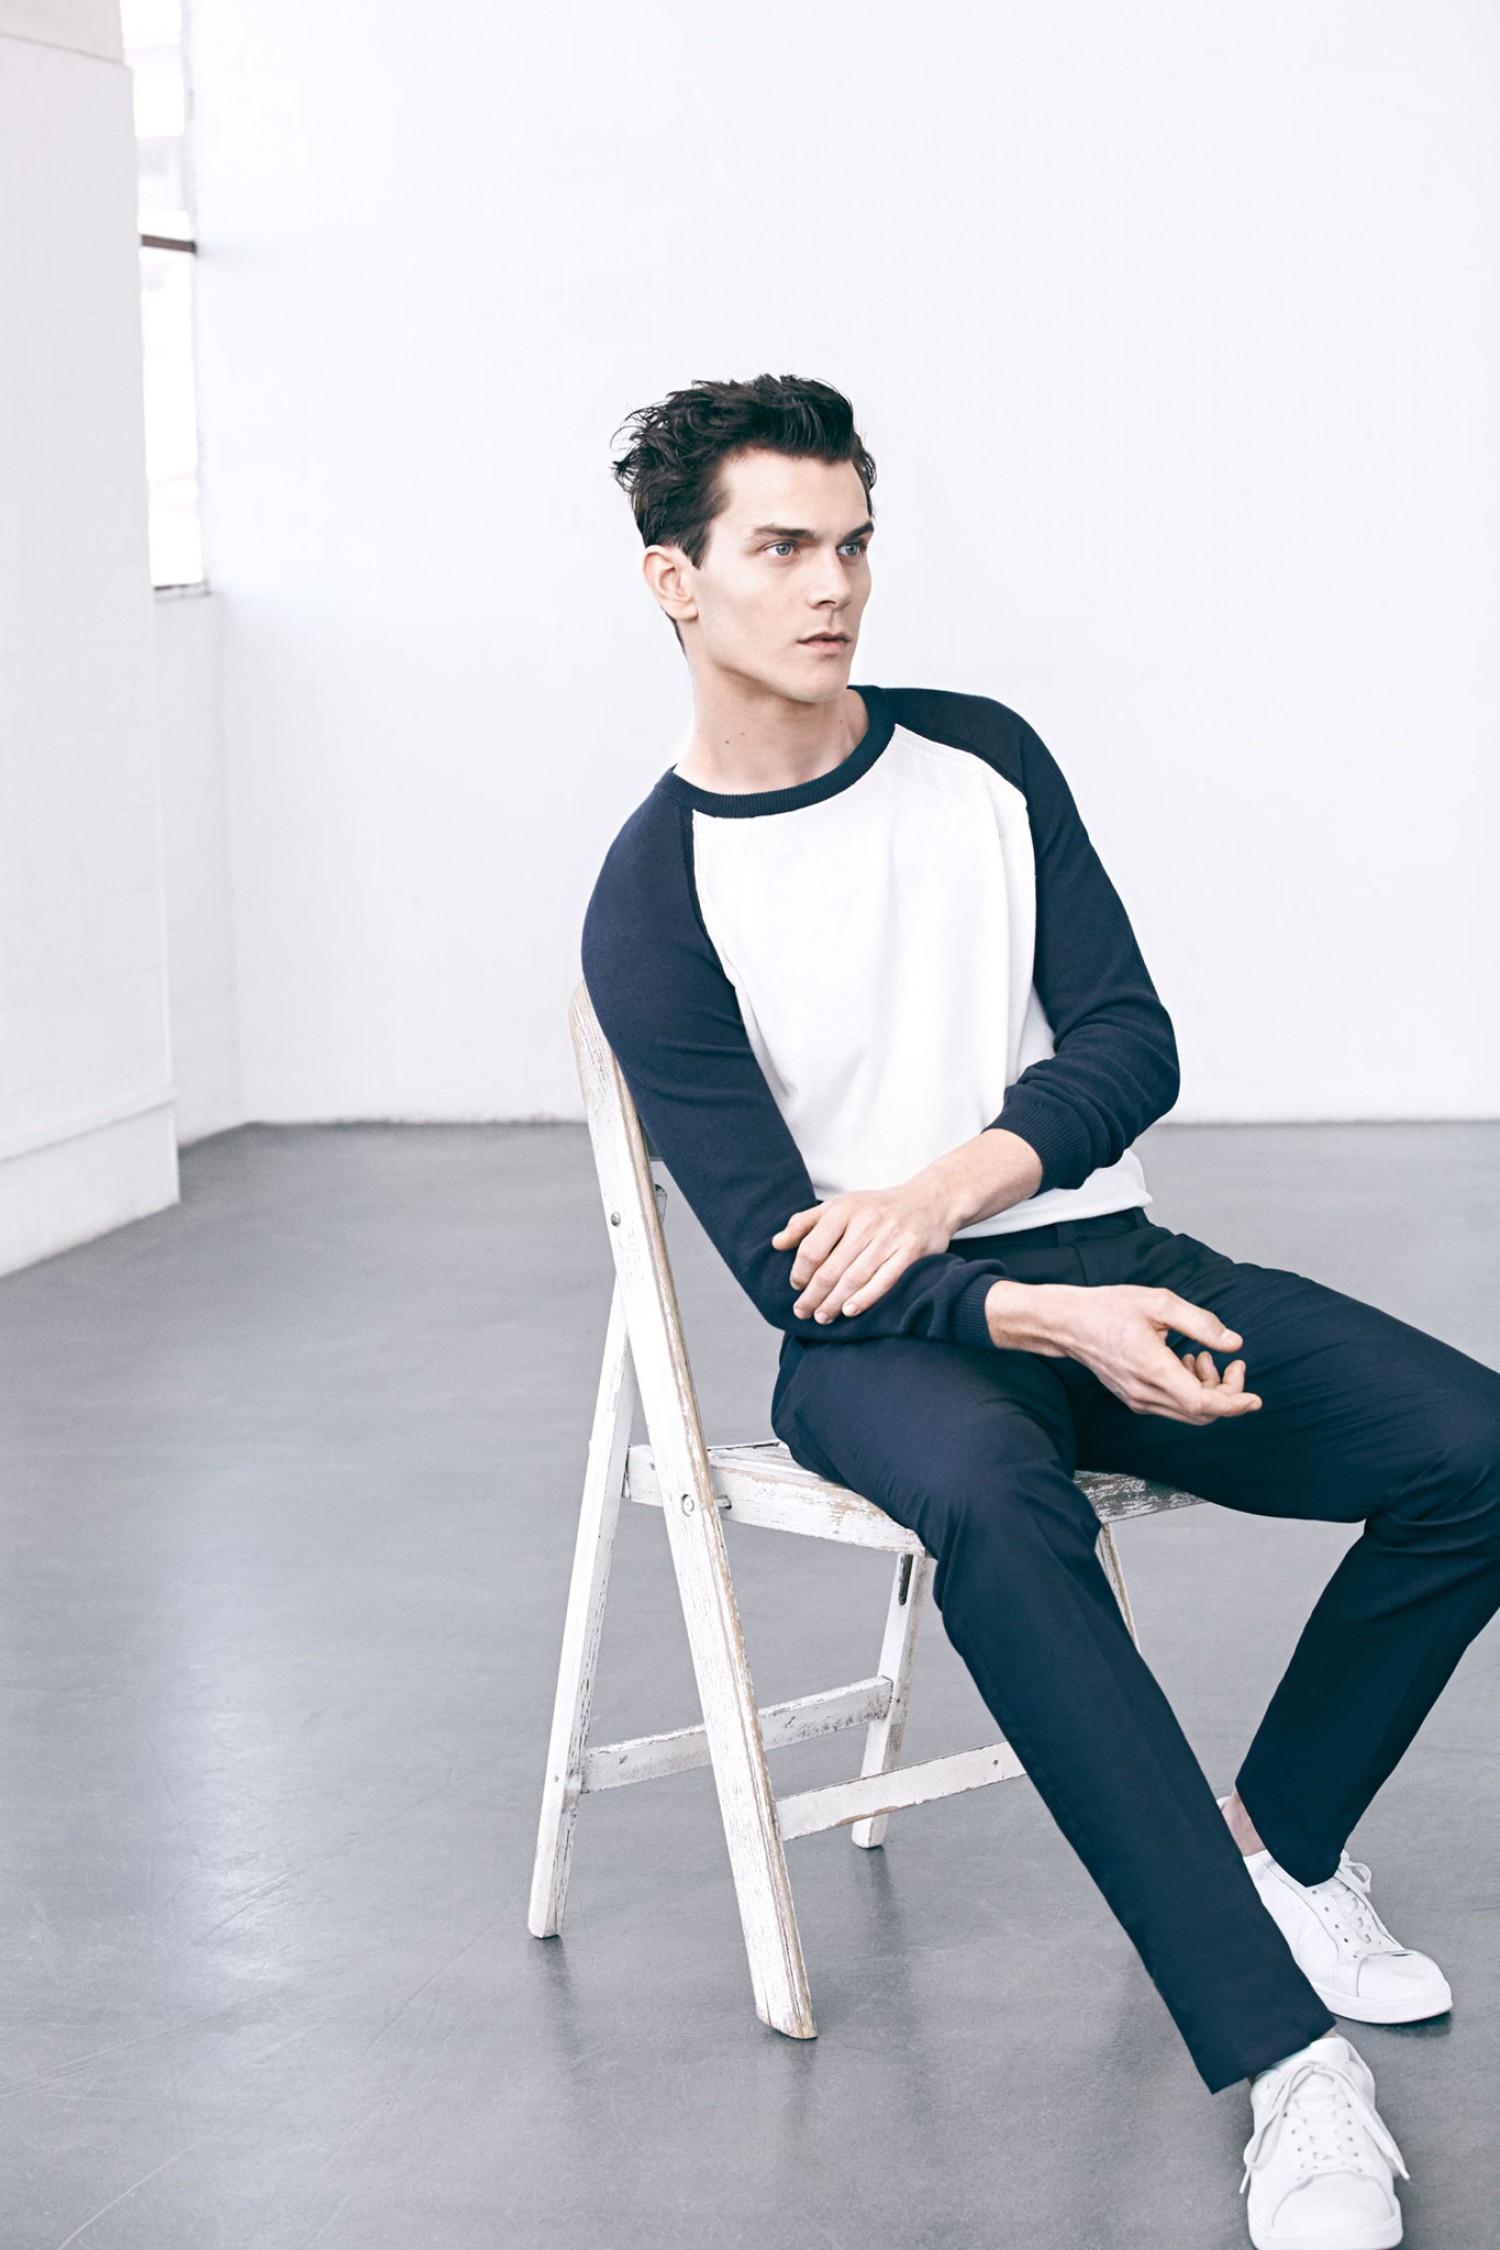 Vincent LaCrocq Models Navy Styles for Mango Men Spring 2015 Lookbook